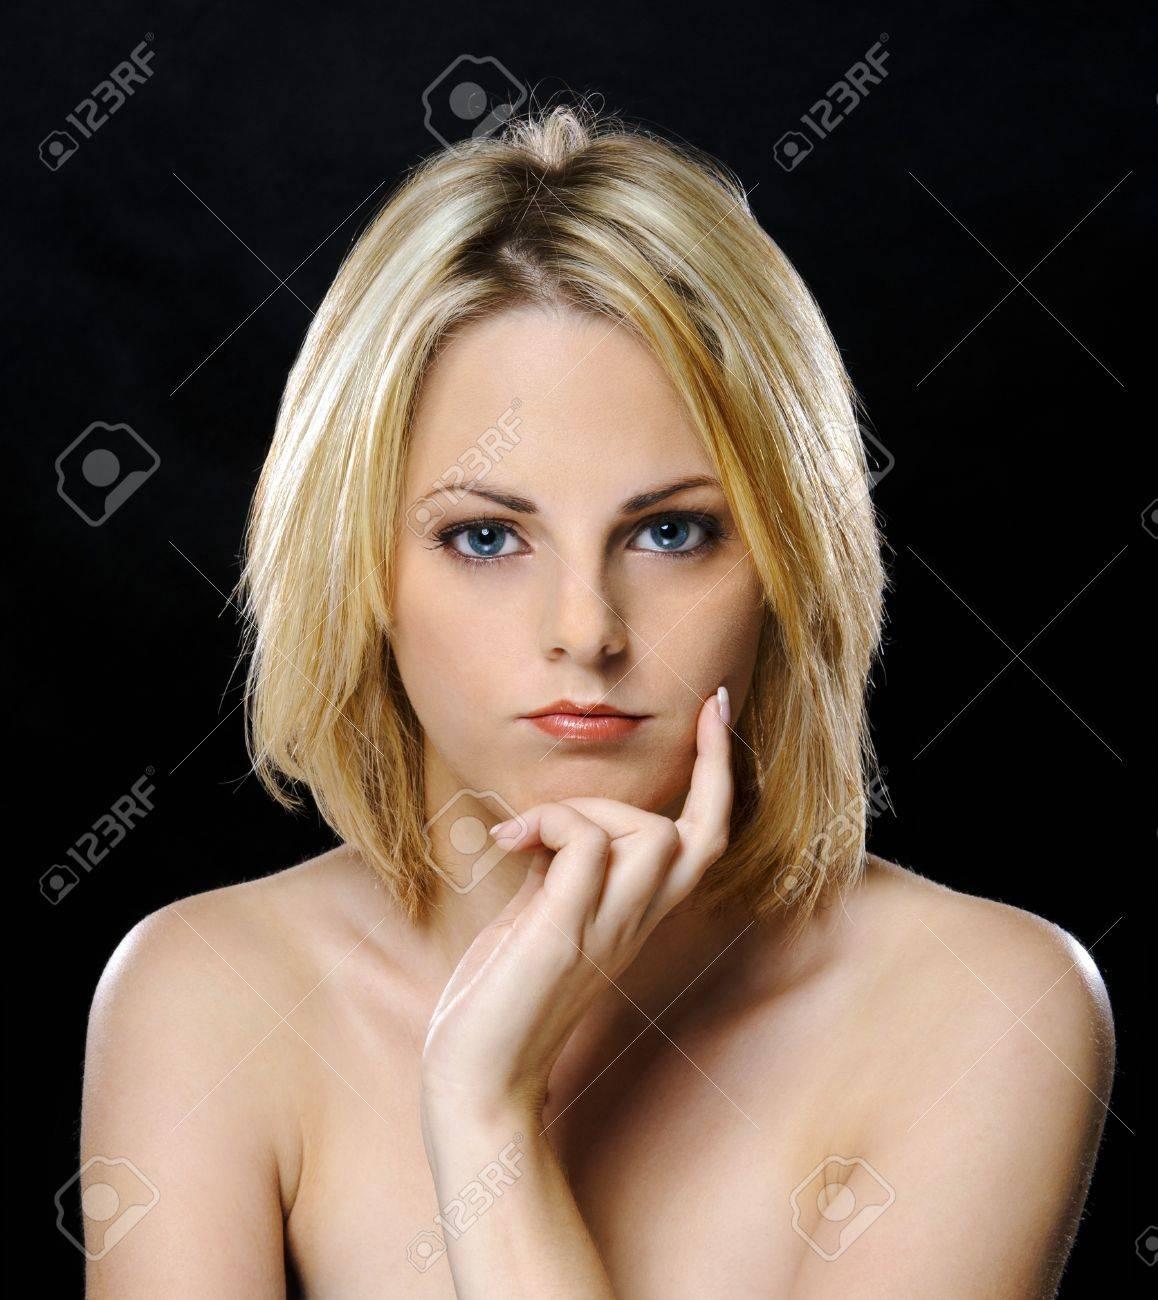 Sorority girls nude threesome